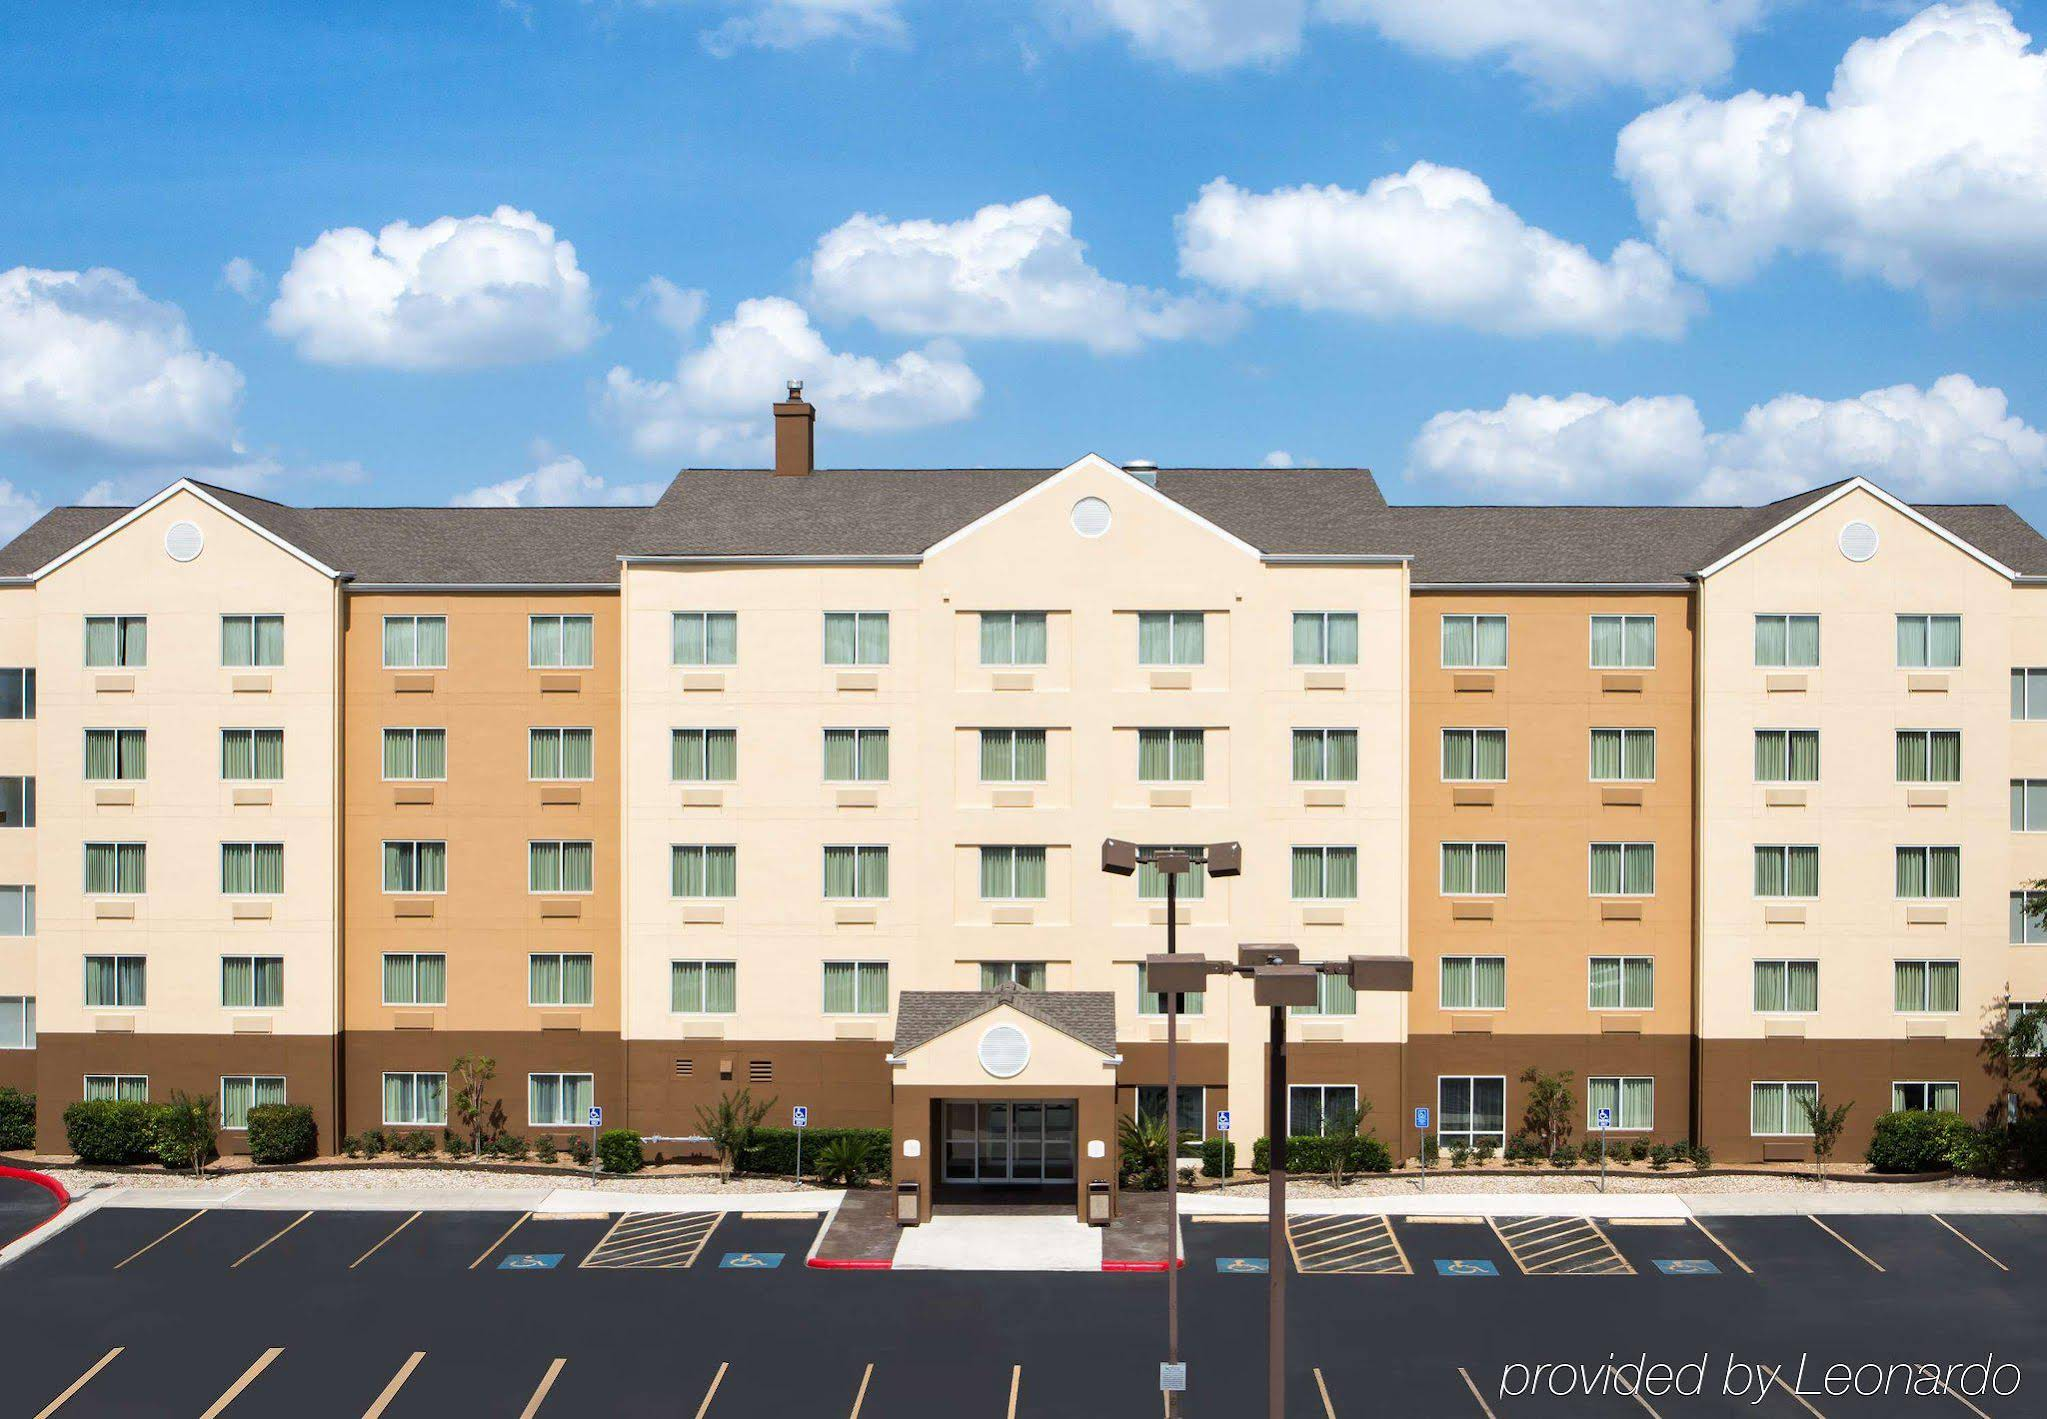 Fairfield Inn & Suites San Antonio Airport